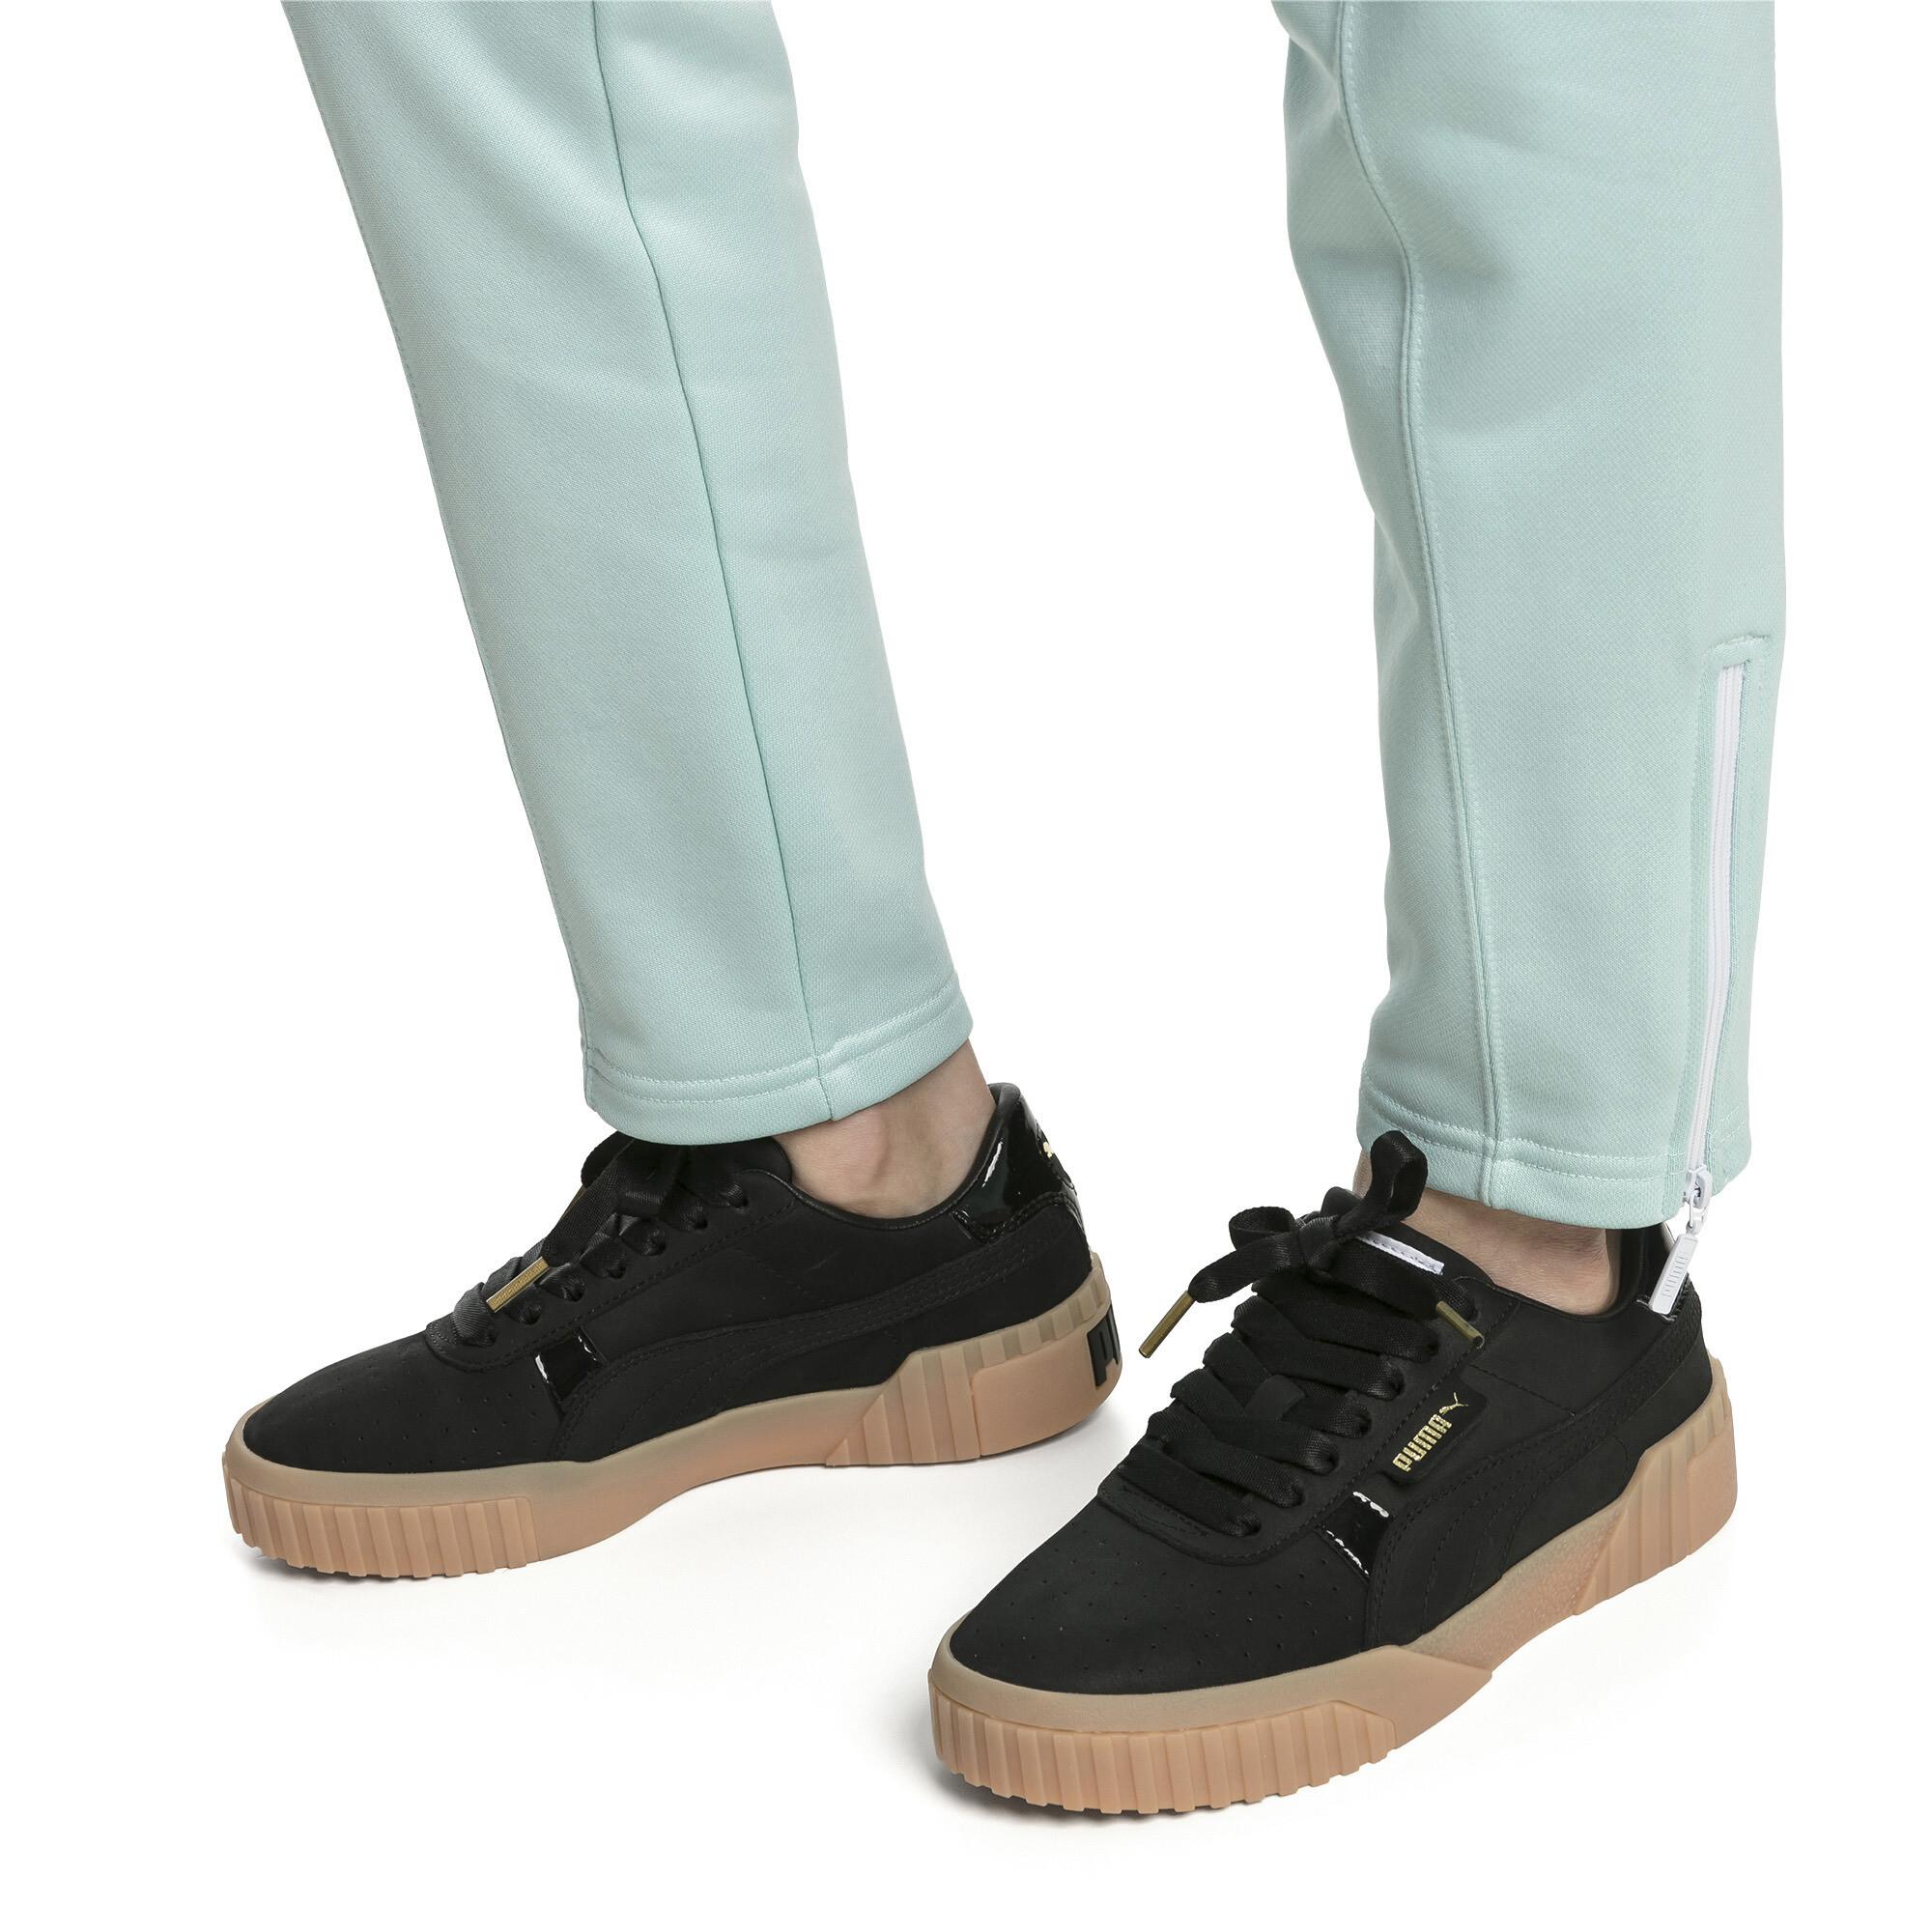 Image Puma Cali Nubuck Women's Sneakers #2